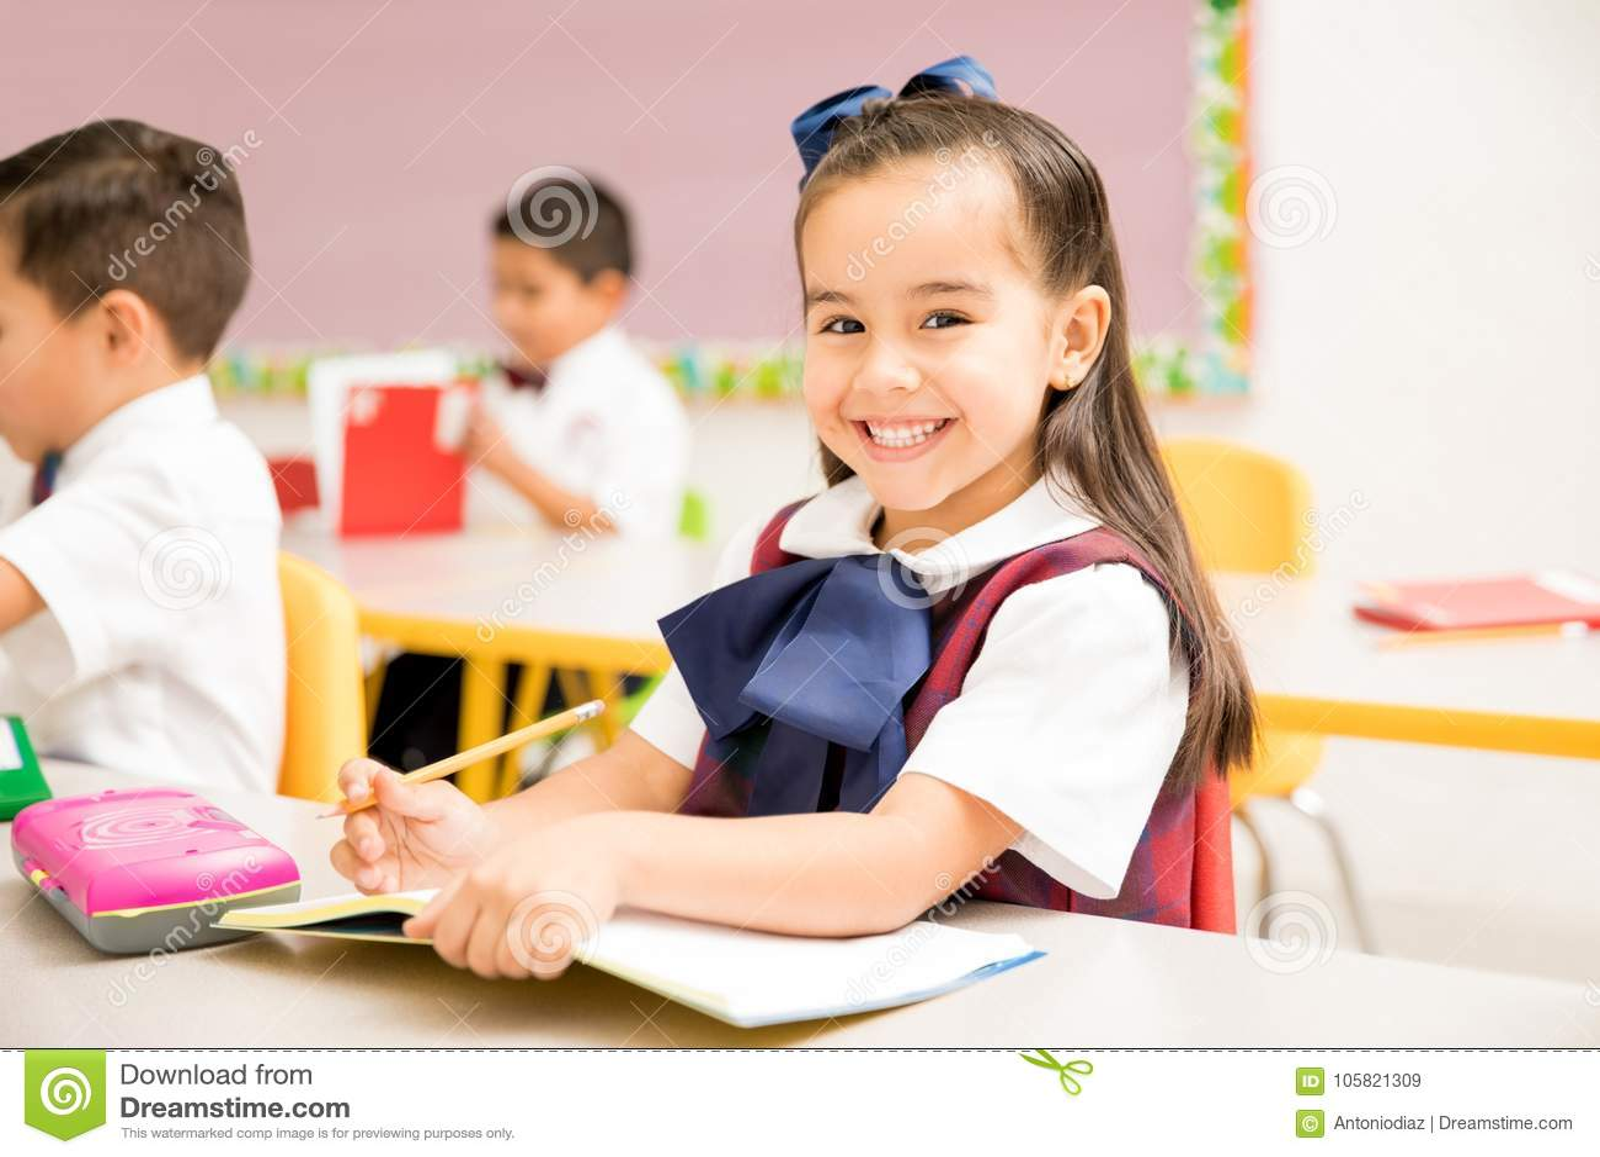 Beautiful preschool student in a classroom